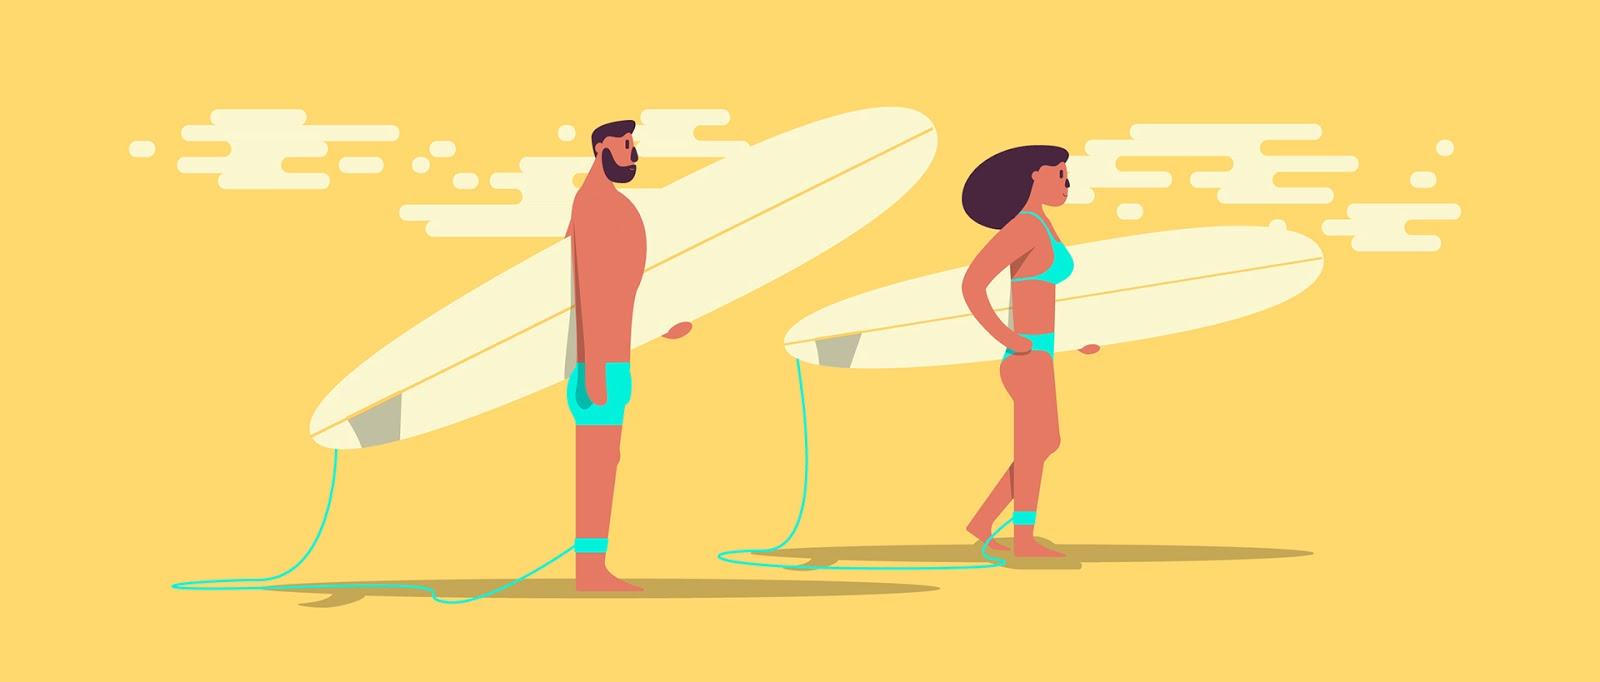 Let's Go Surfing, un proyecto de Alex Gosti